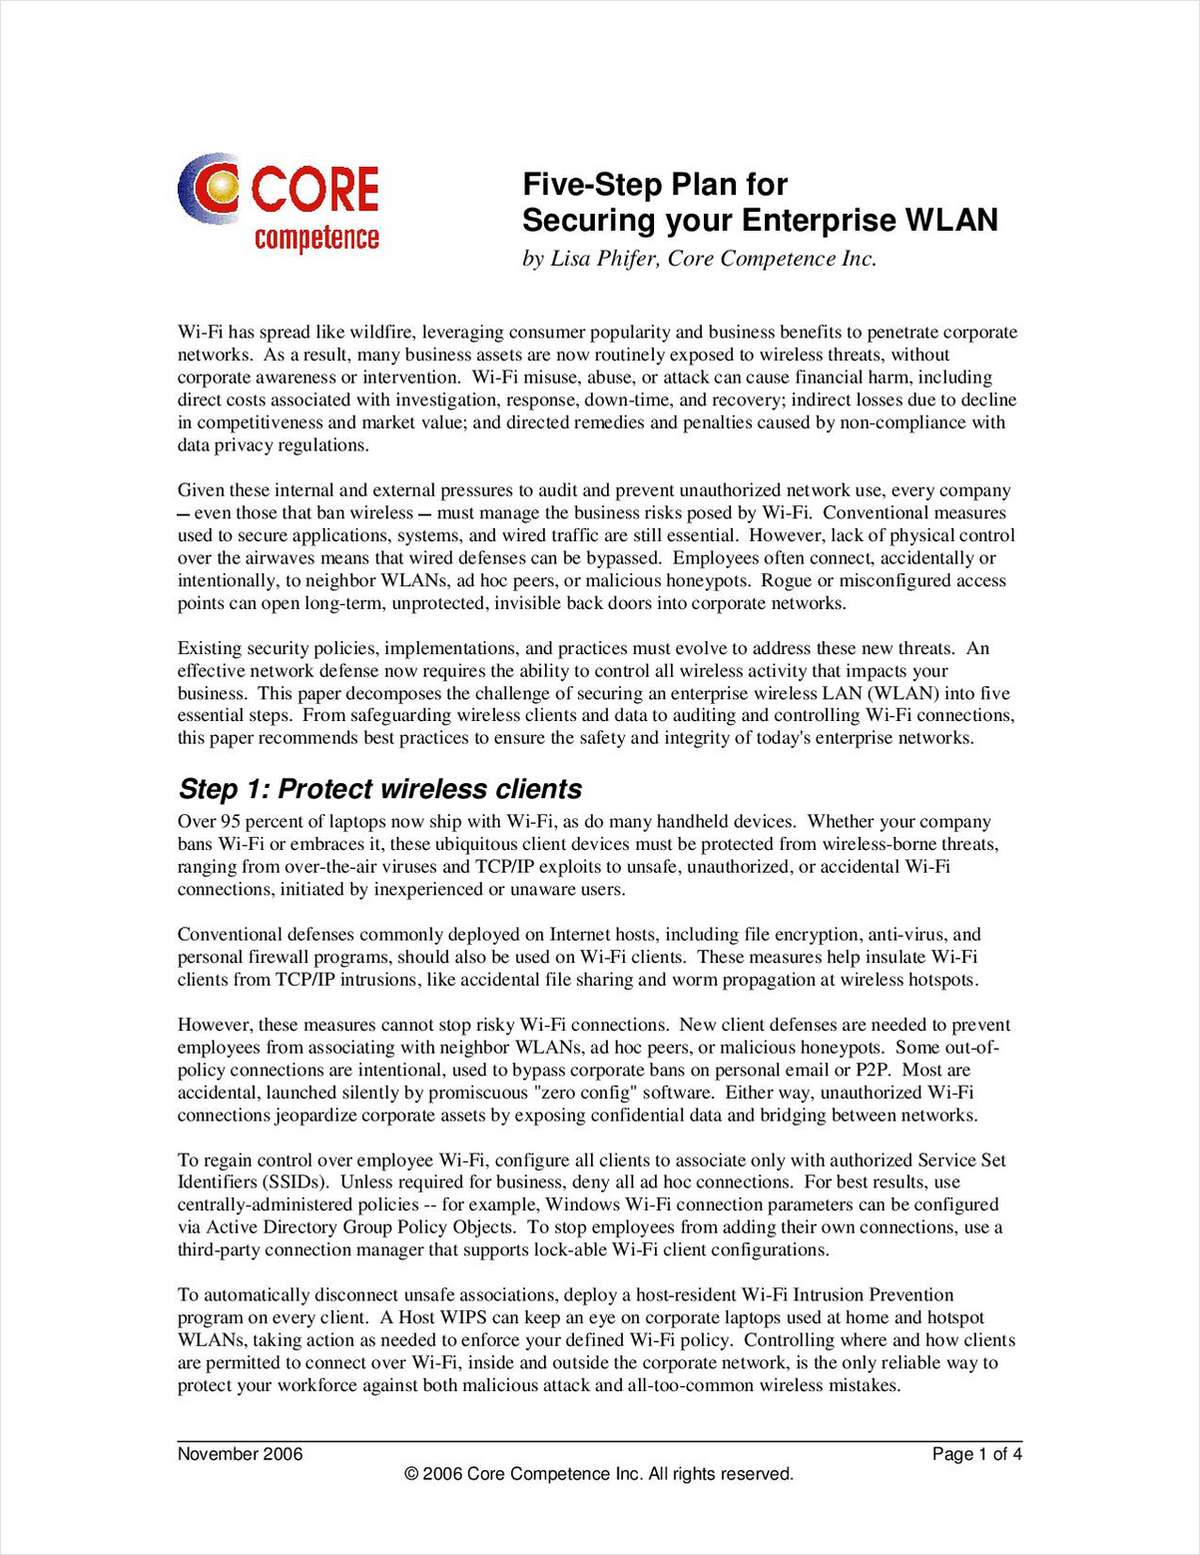 Five-Step Plan for Securing Your Enterprise WLAN